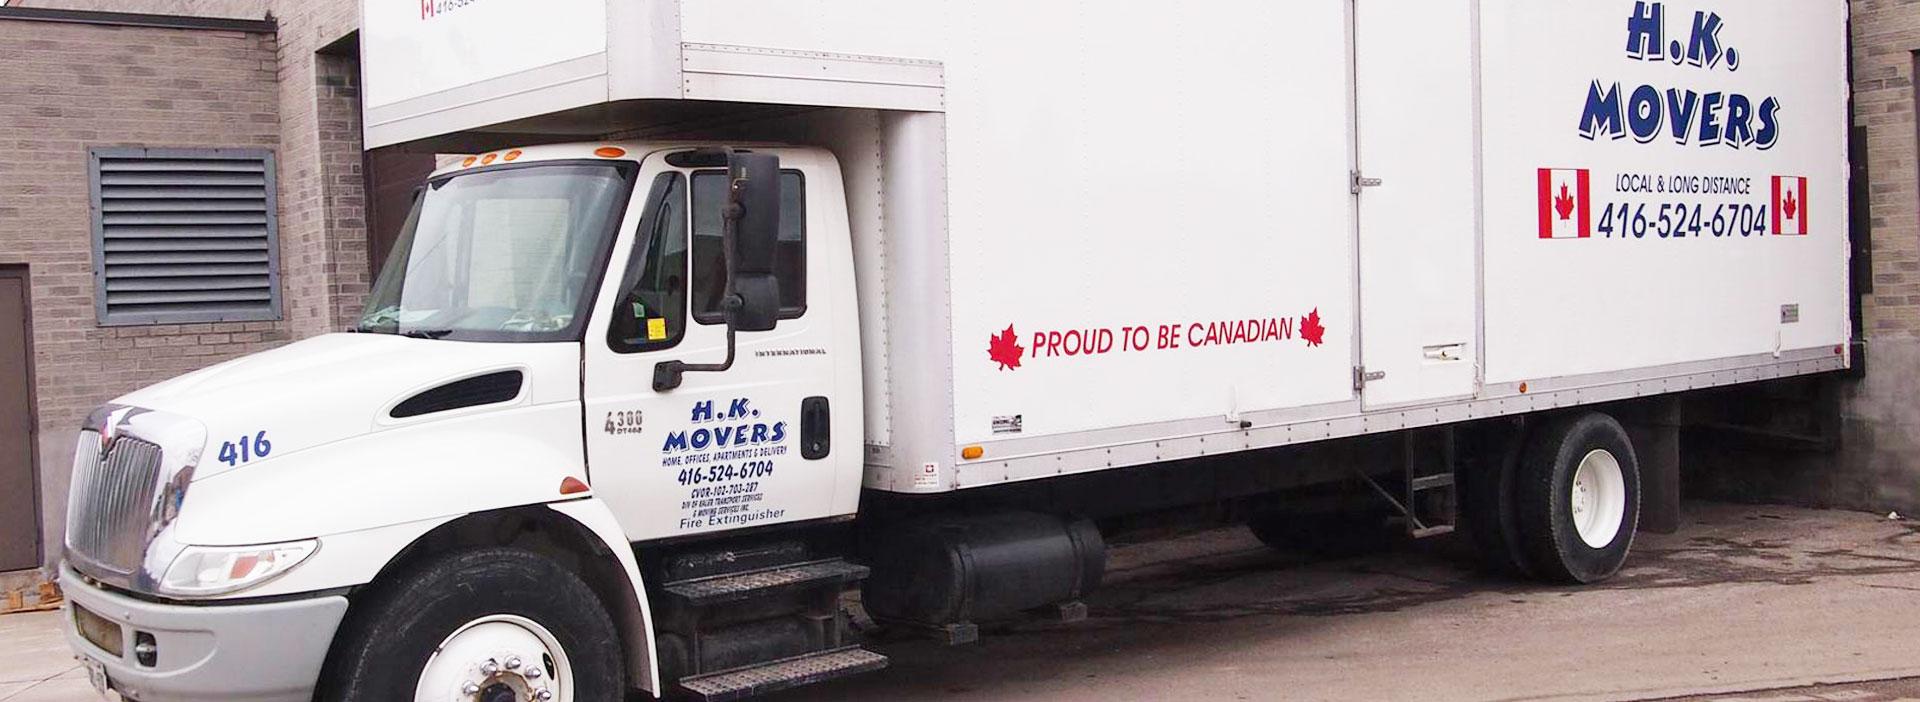 HK Movers - Moving Companies Toronto